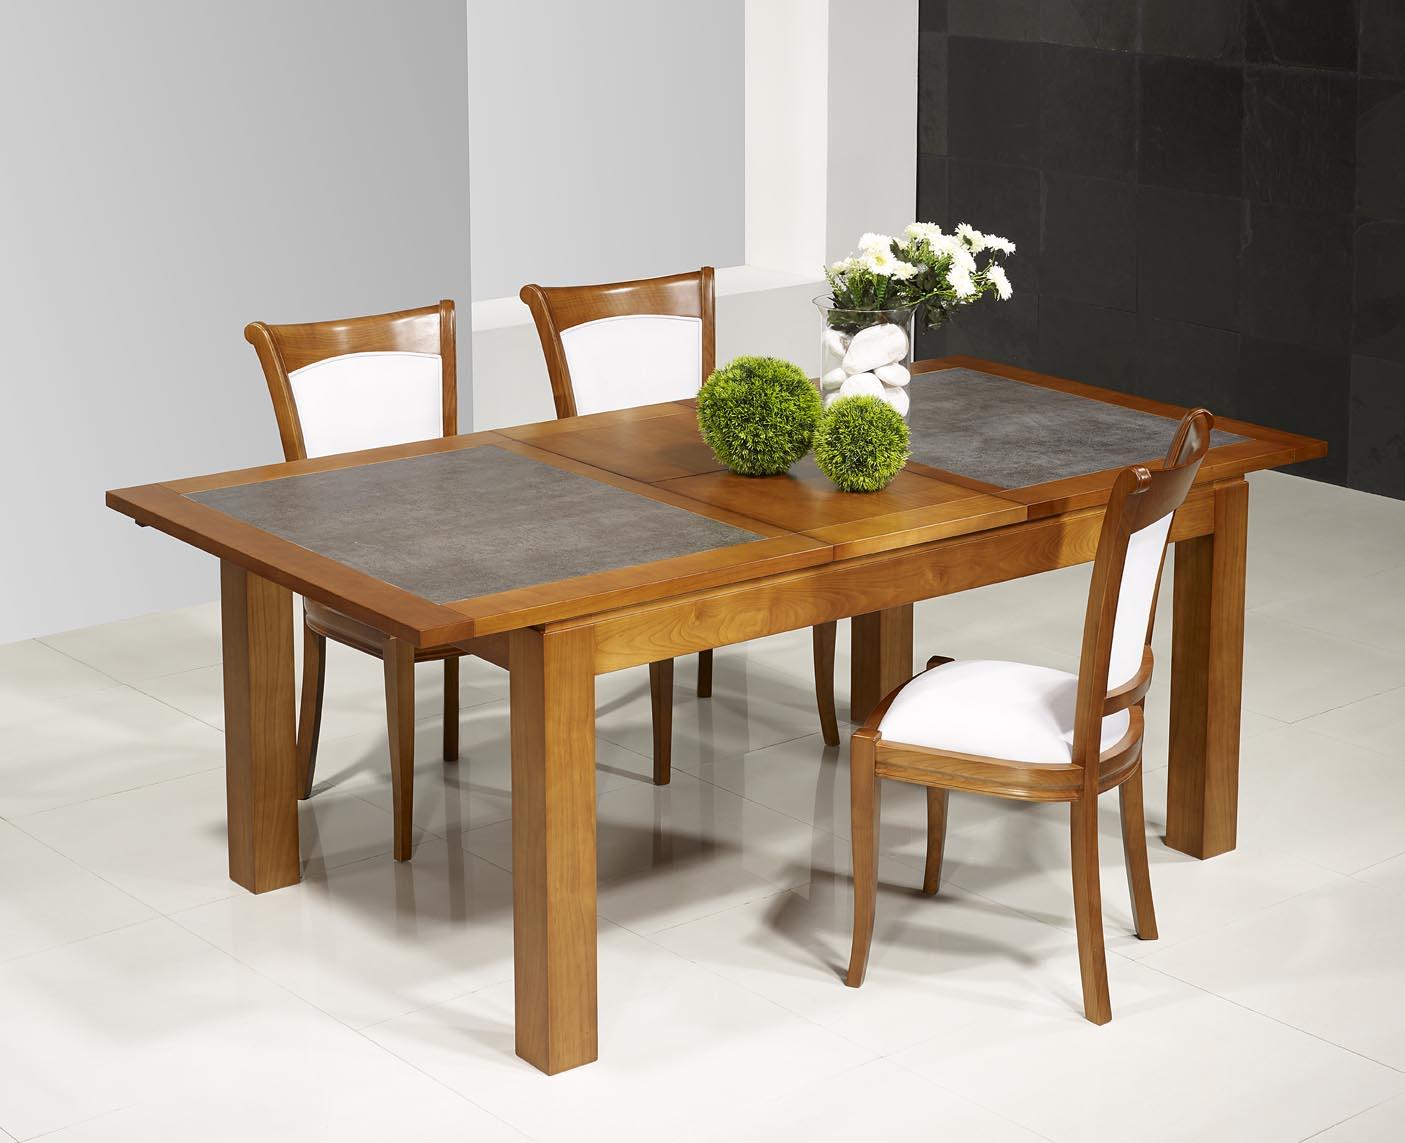 table de repas aurore en merisier massif contemporaine. Black Bedroom Furniture Sets. Home Design Ideas